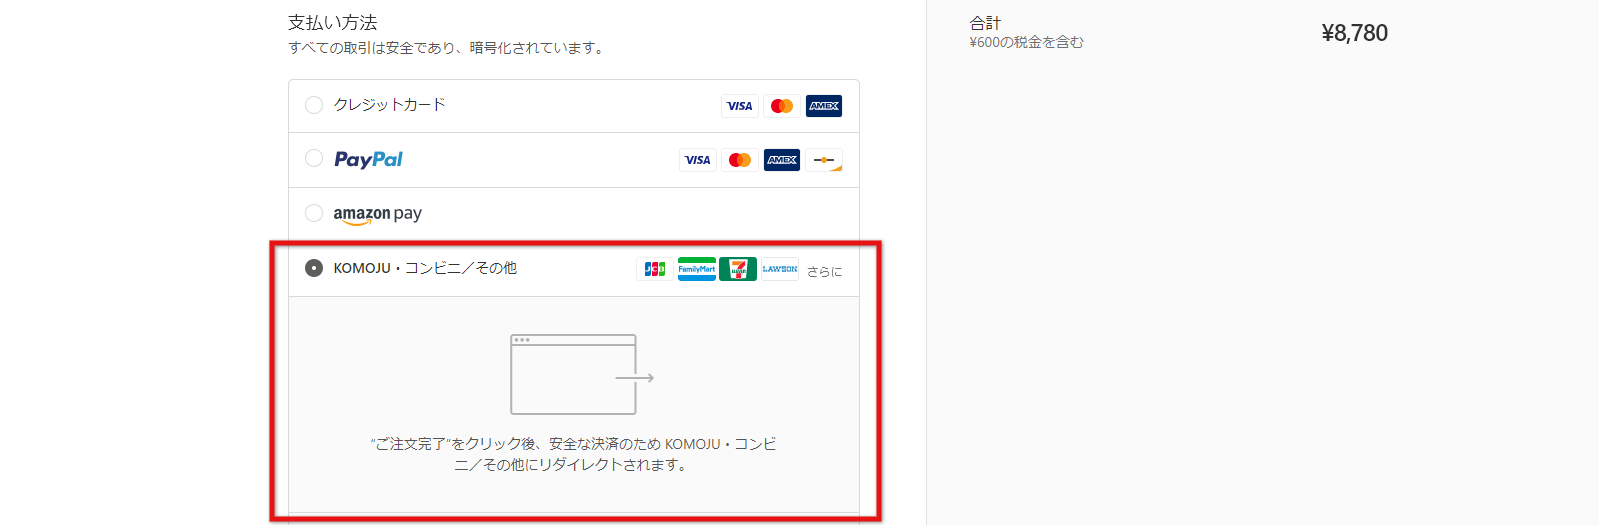 screenshot shop.manduka.jp 2019.01.30 19 19 13 - Manduka 日本公式サイト サイトリニューアルのお知らせ